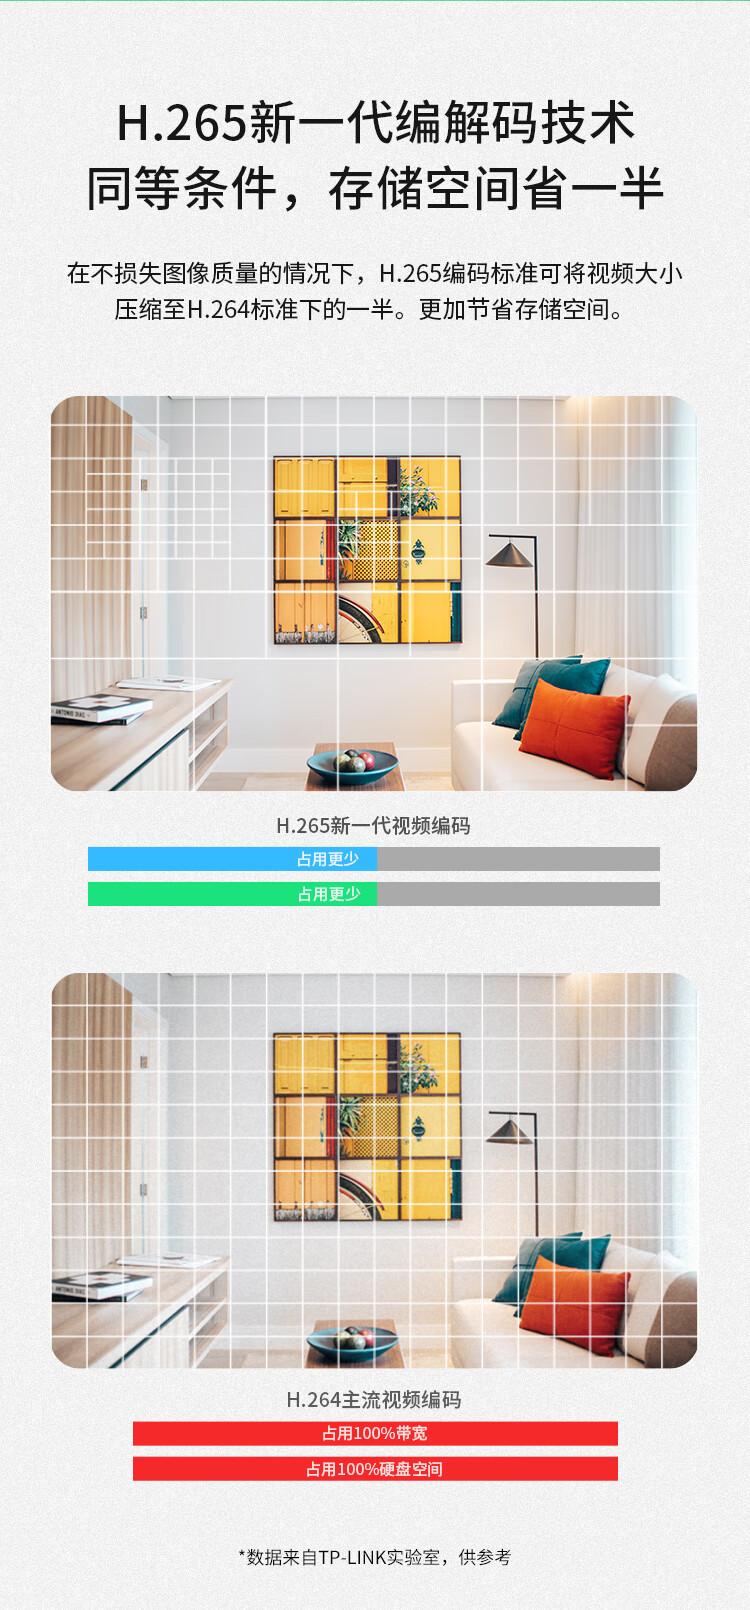 TP-LINK 无线监控摄像头 1080P高清家用智能网络家庭安防监控器摄像机 360度全景wifi手机远程TL-IPC42C-4